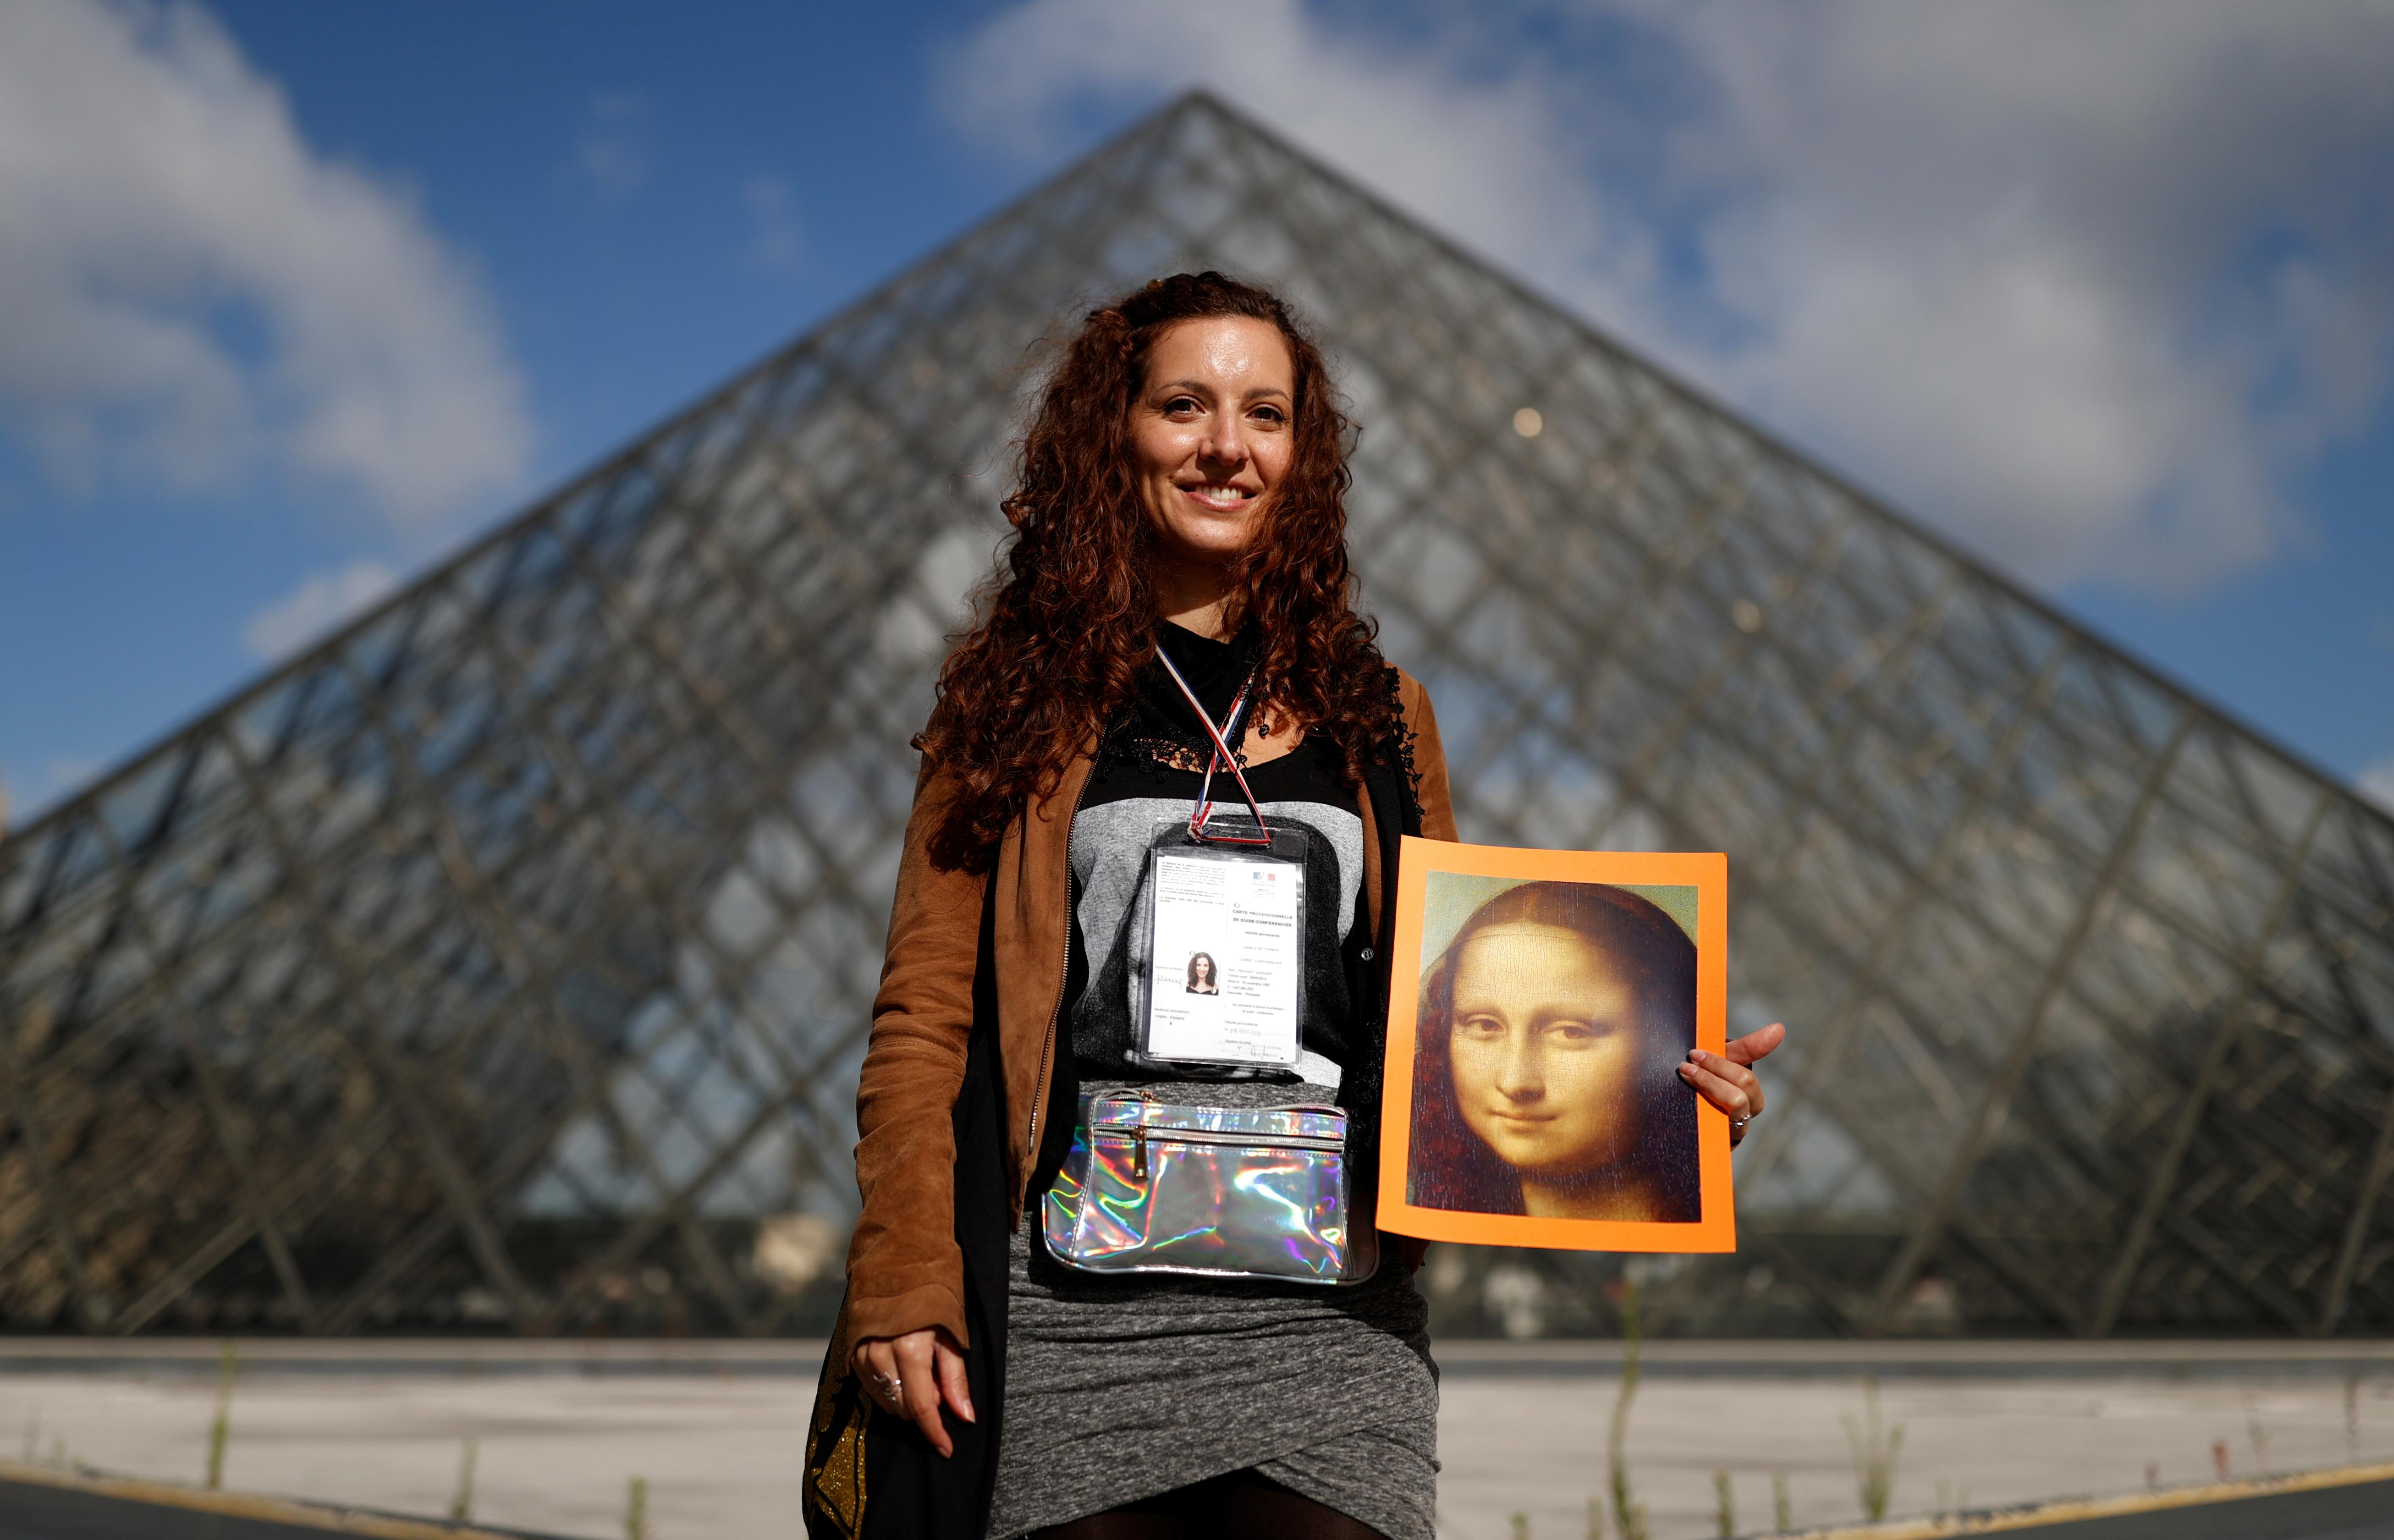 La guía turística Manuela Feuchot-Gazquez posa frente al museo (REUTERS/Christian Hartmann)